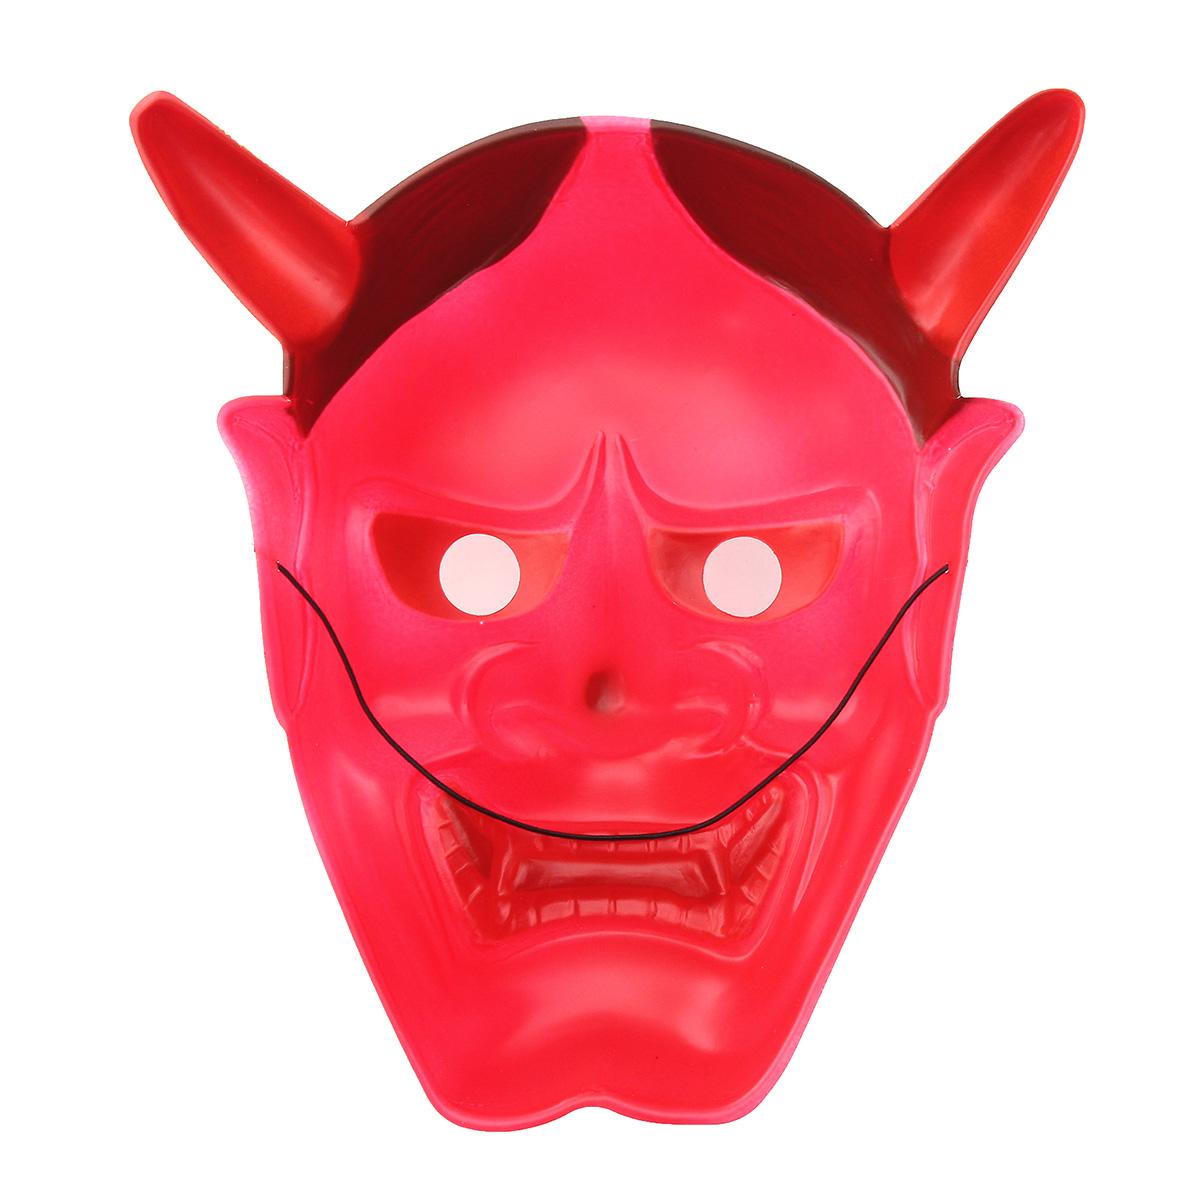 Devil Demon Costume Masquerade Halloween Party Carnival Mask